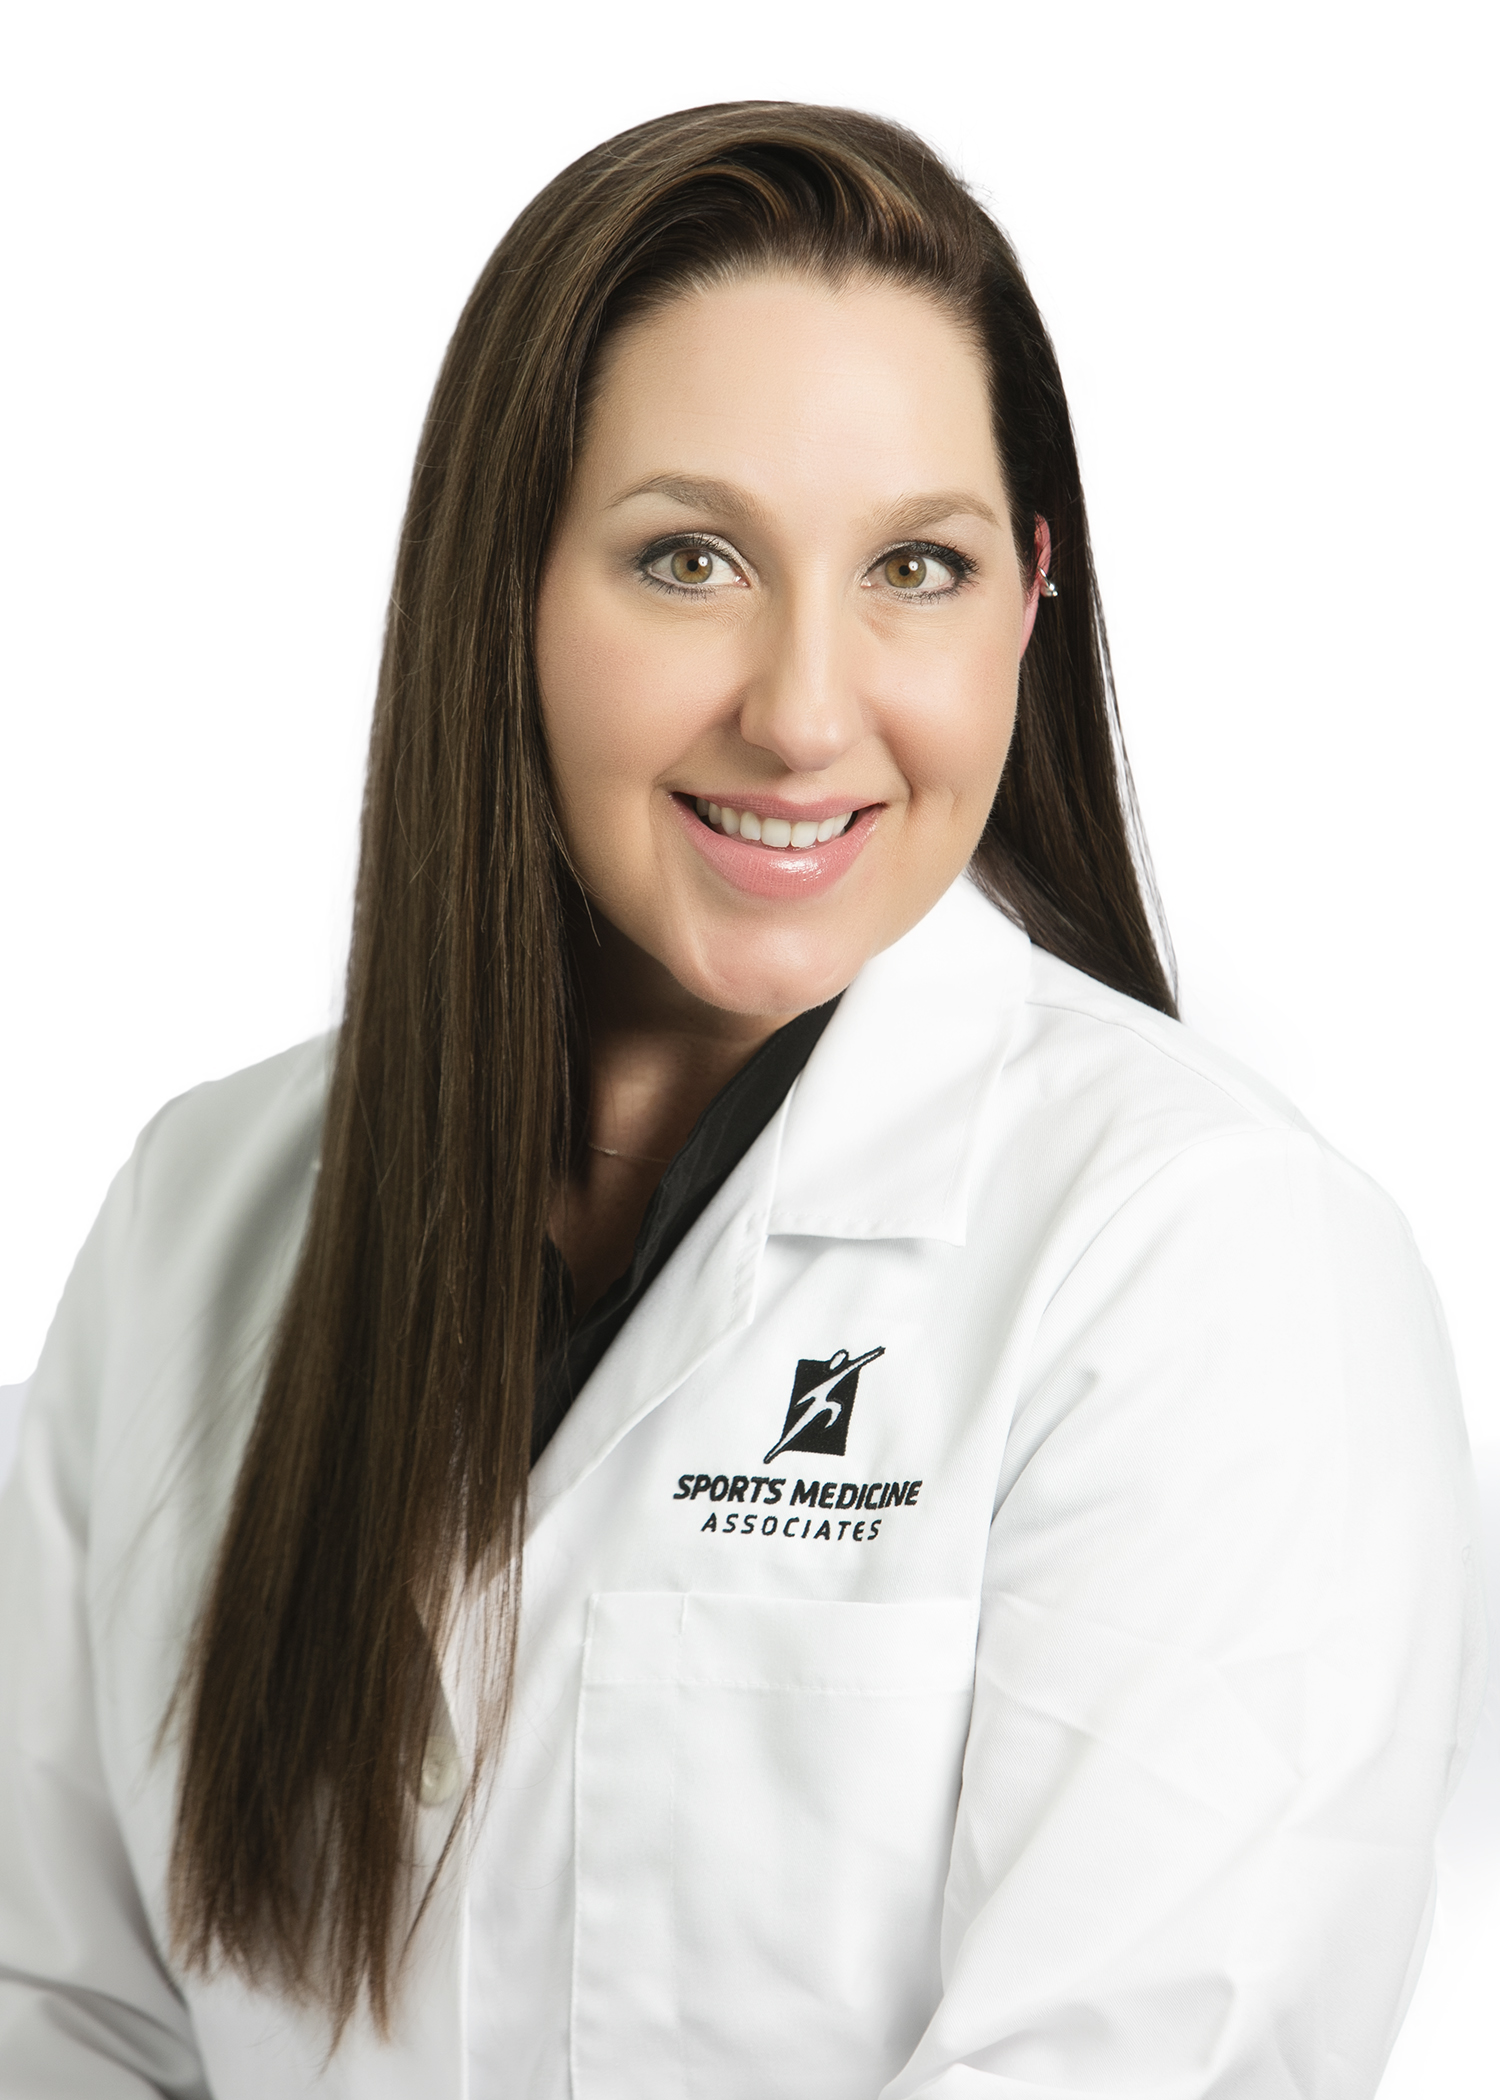 Lindsay Stephens, D.O. - Primary Care Sports Medicine